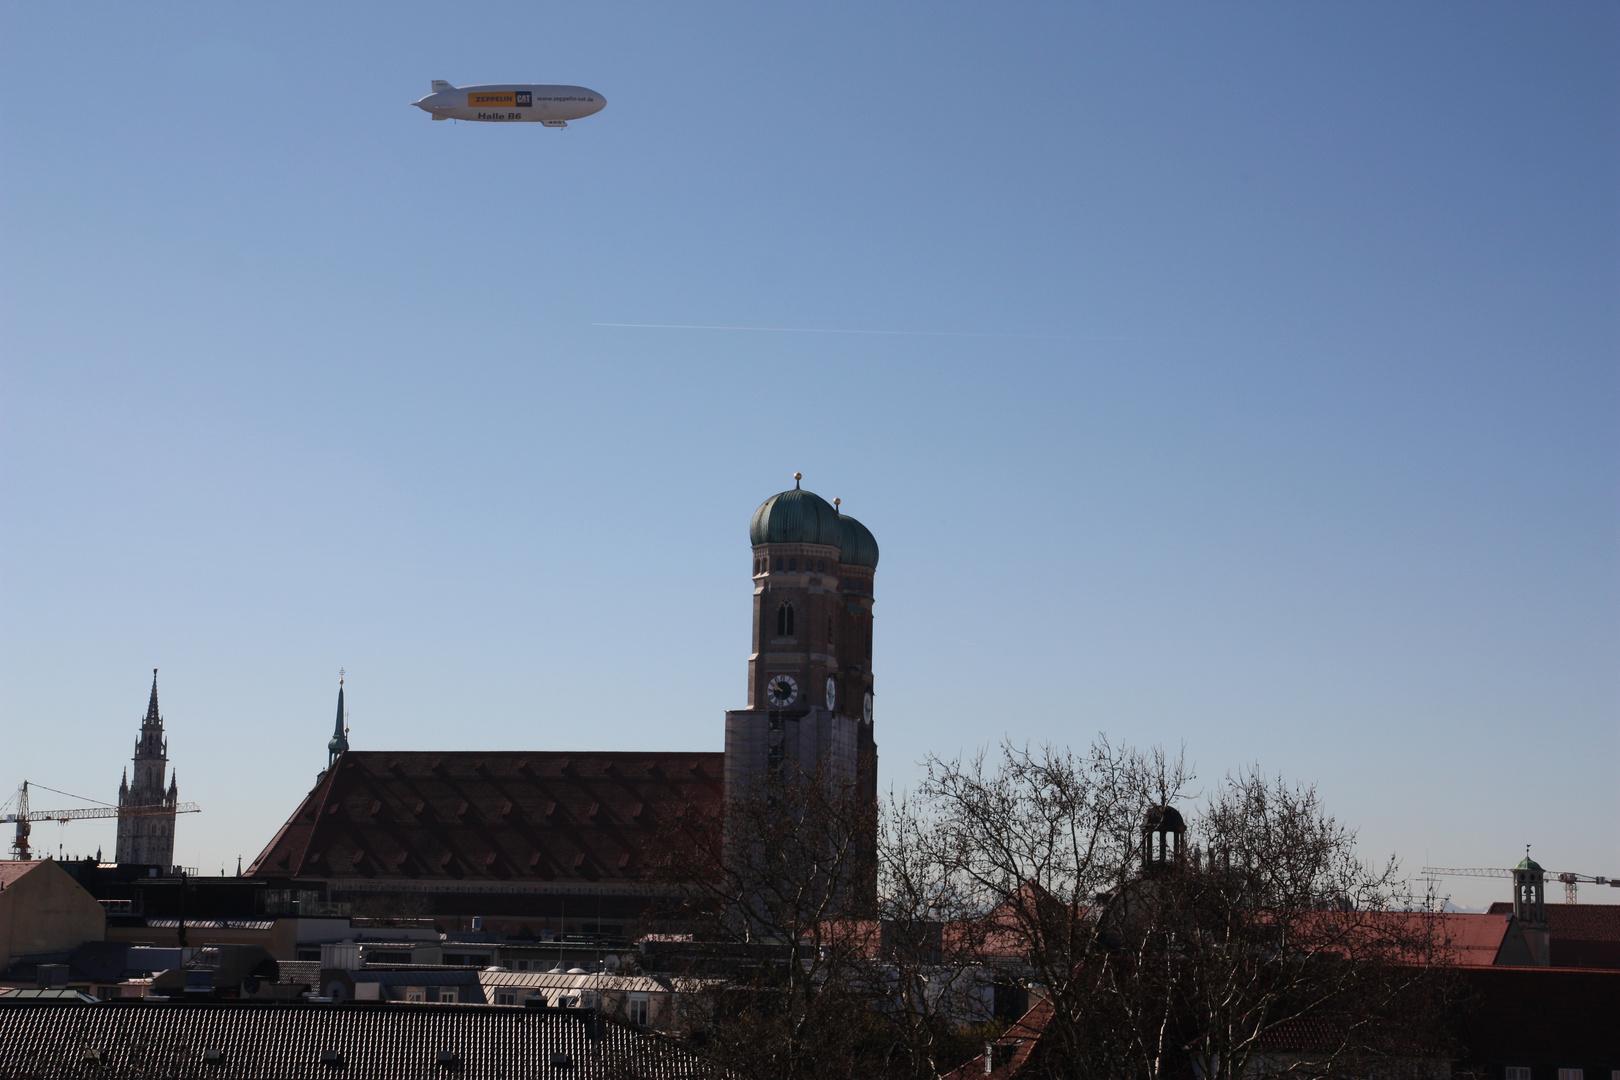 Zeppelin über Frauenkirche